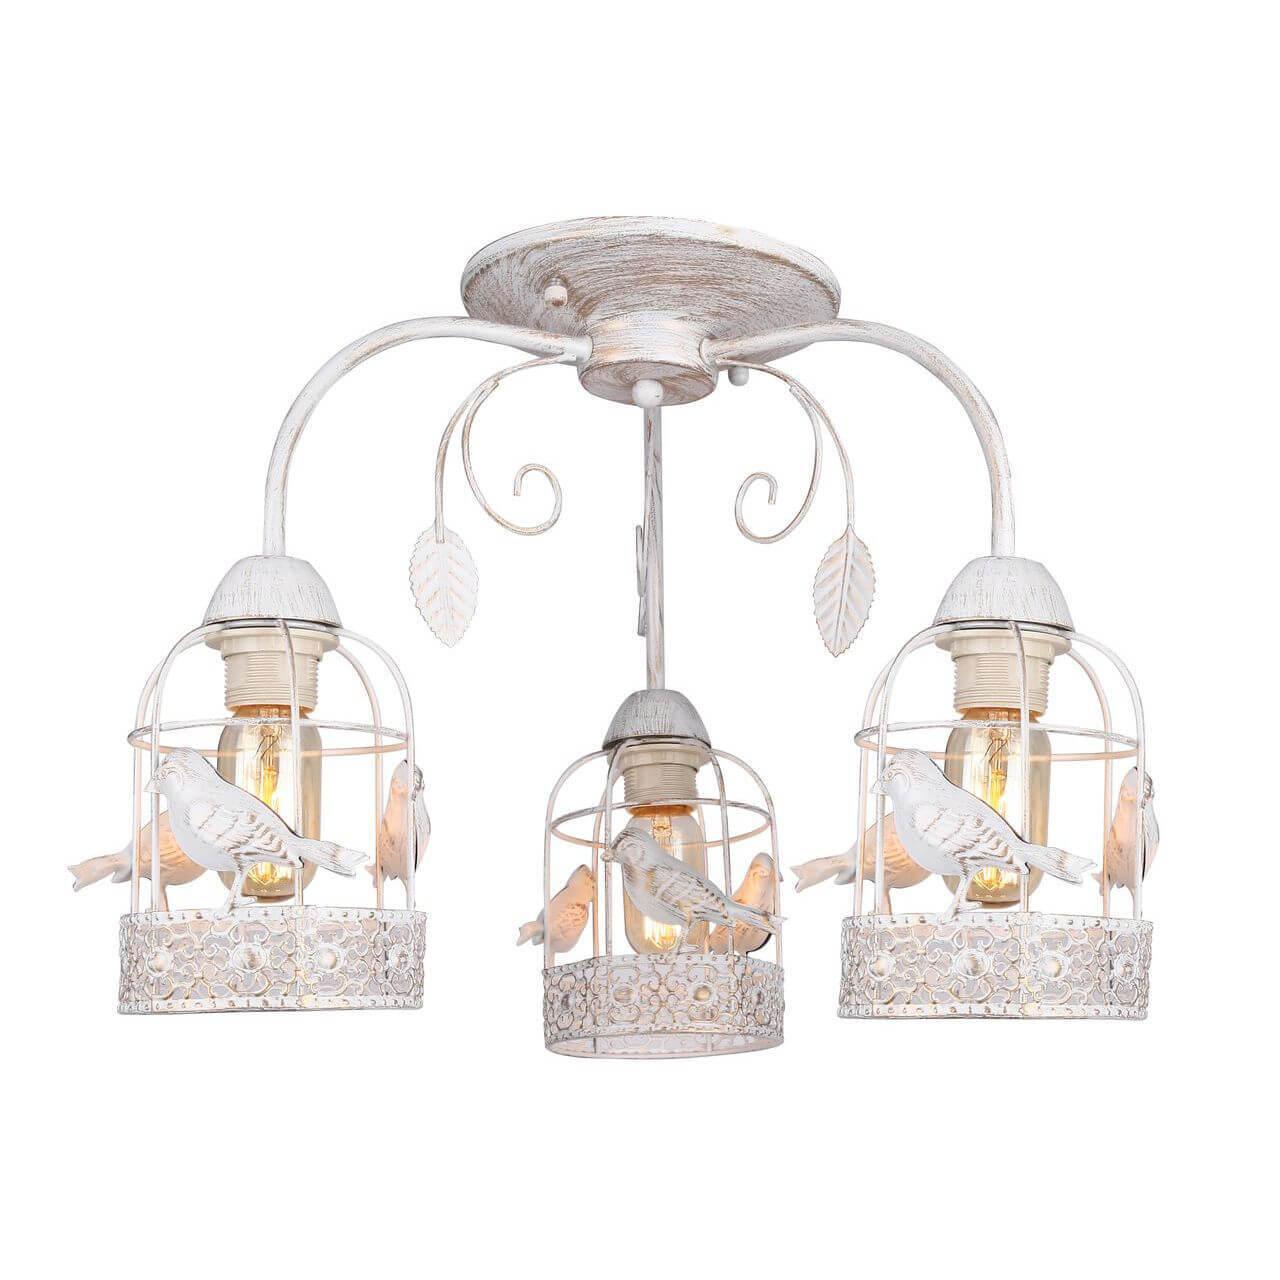 цена на Потолочная люстра Arte Lamp Cincia A5090PL-3WG